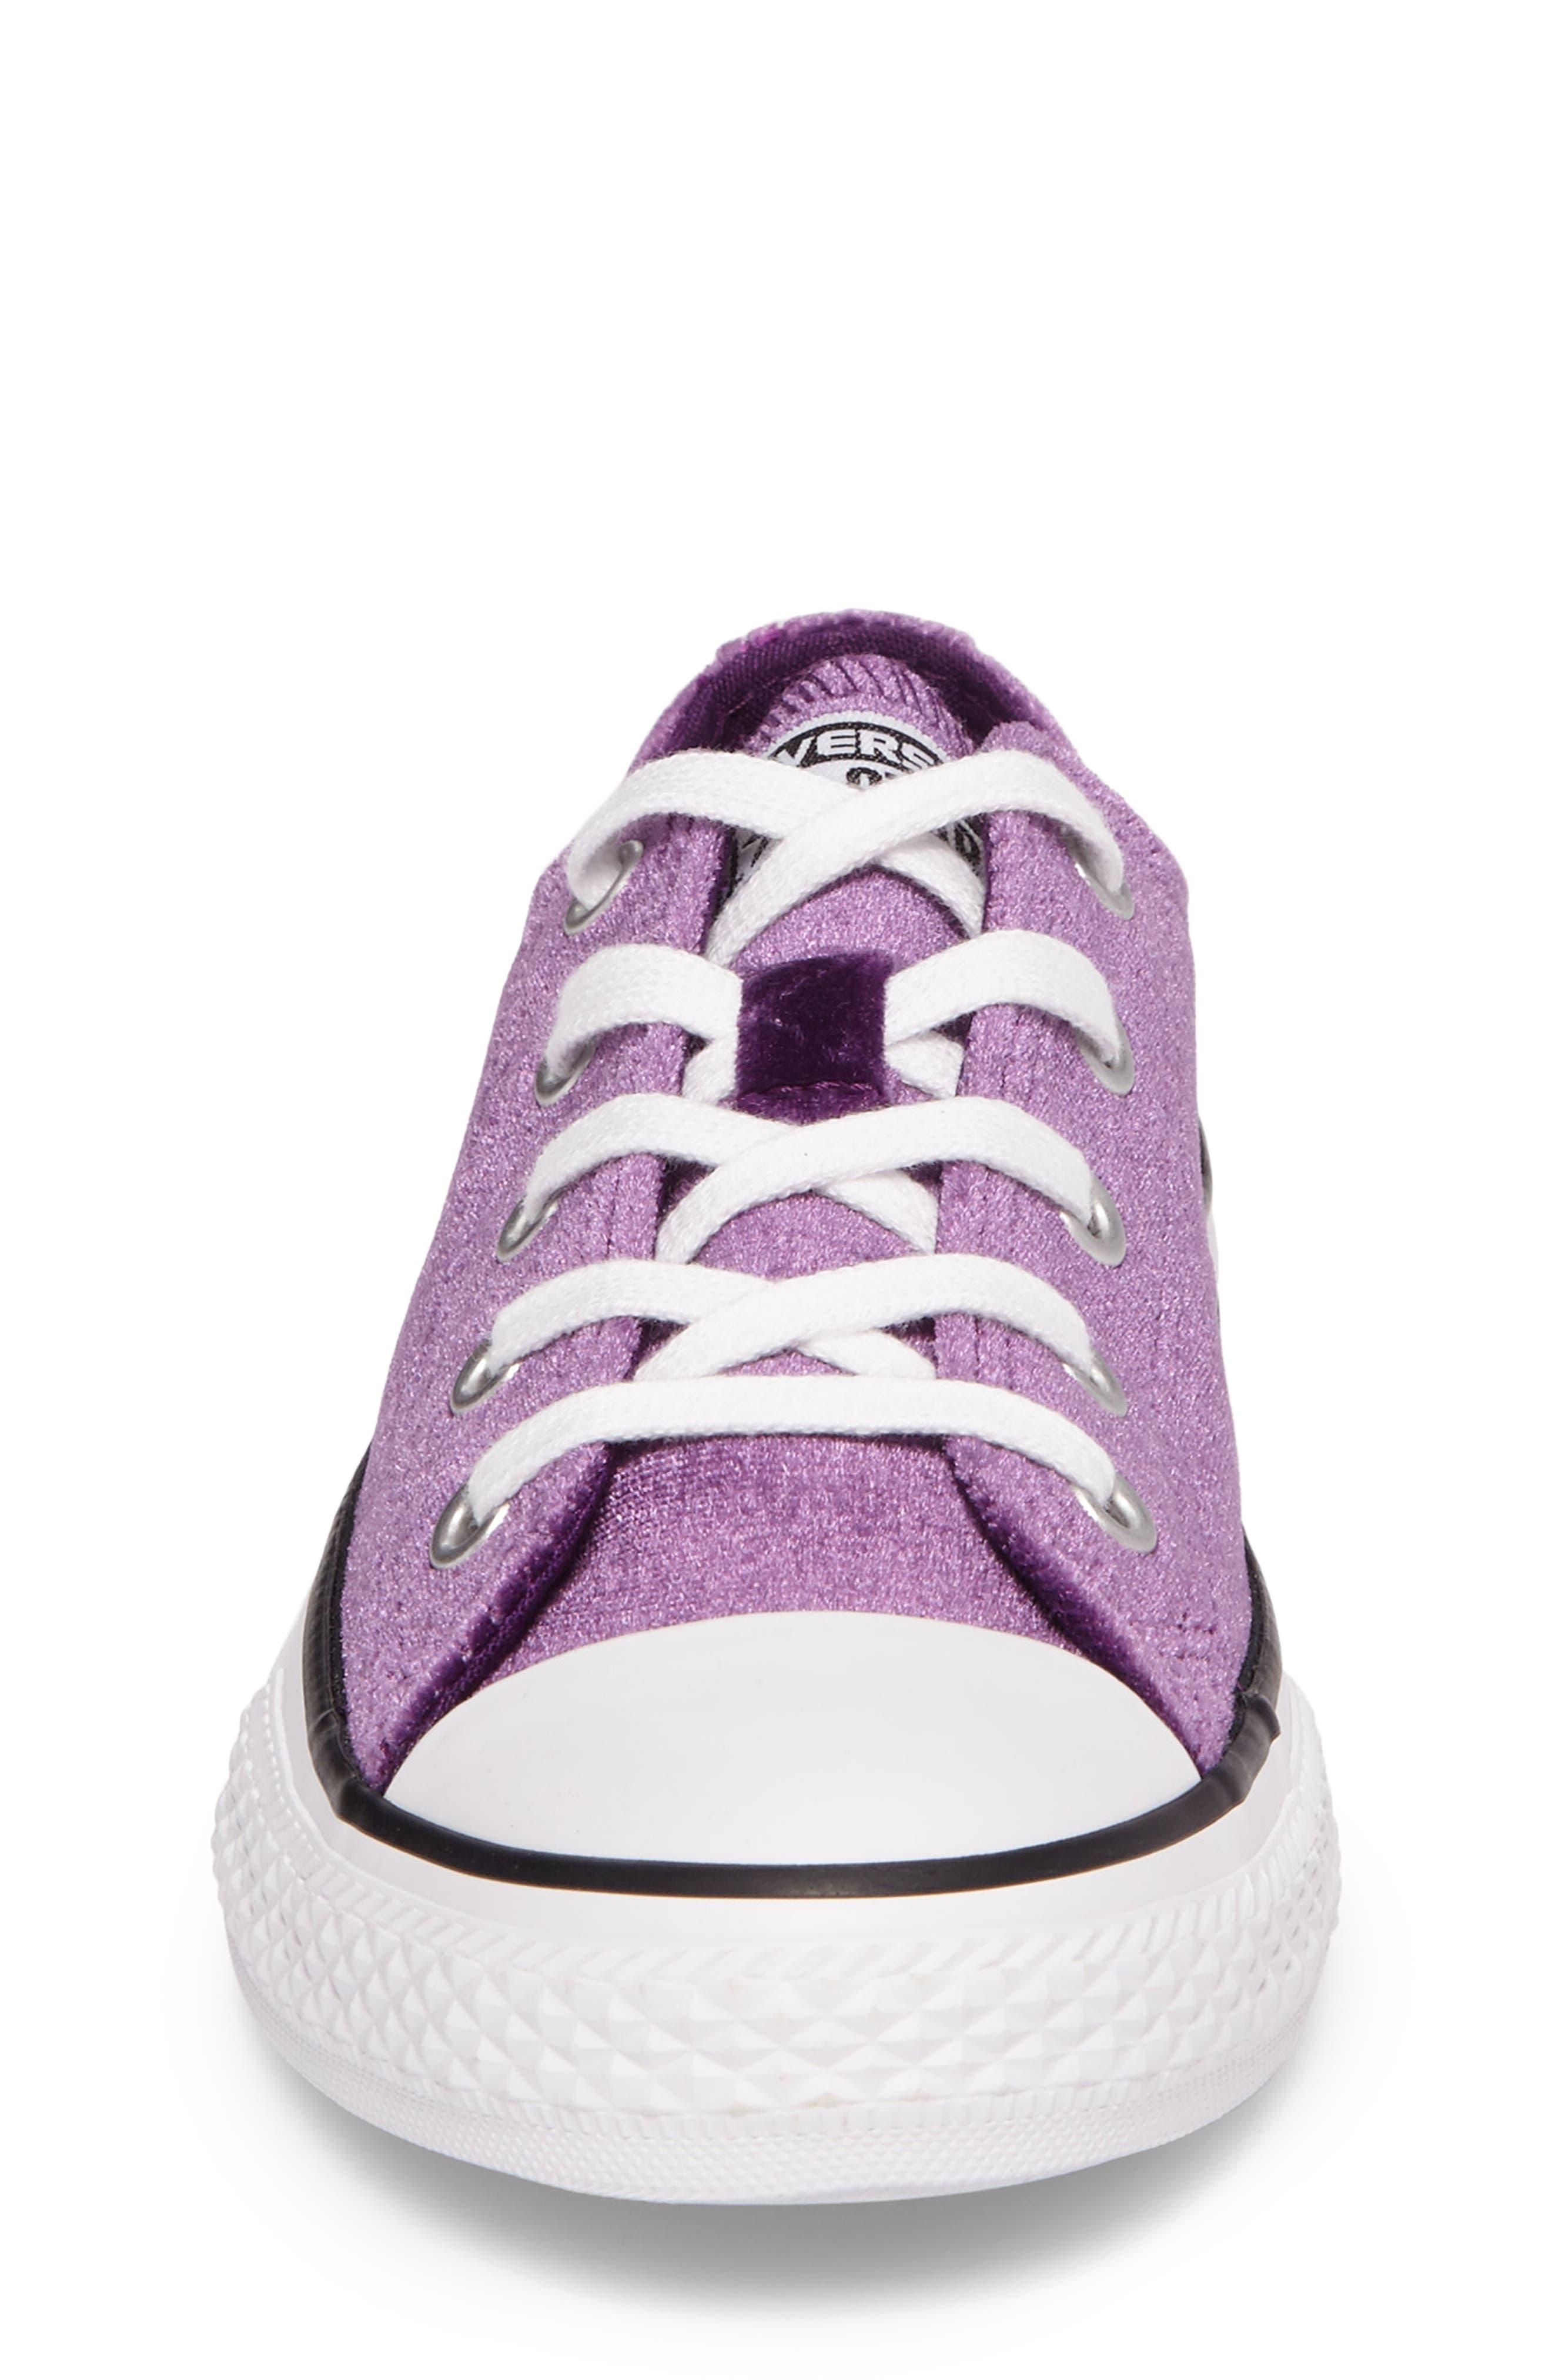 Chuck Taylor<sup>®</sup> All Star<sup>®</sup> Velvet OX Low Top Sneaker,                             Alternate thumbnail 4, color,                             Night Purple Velvet